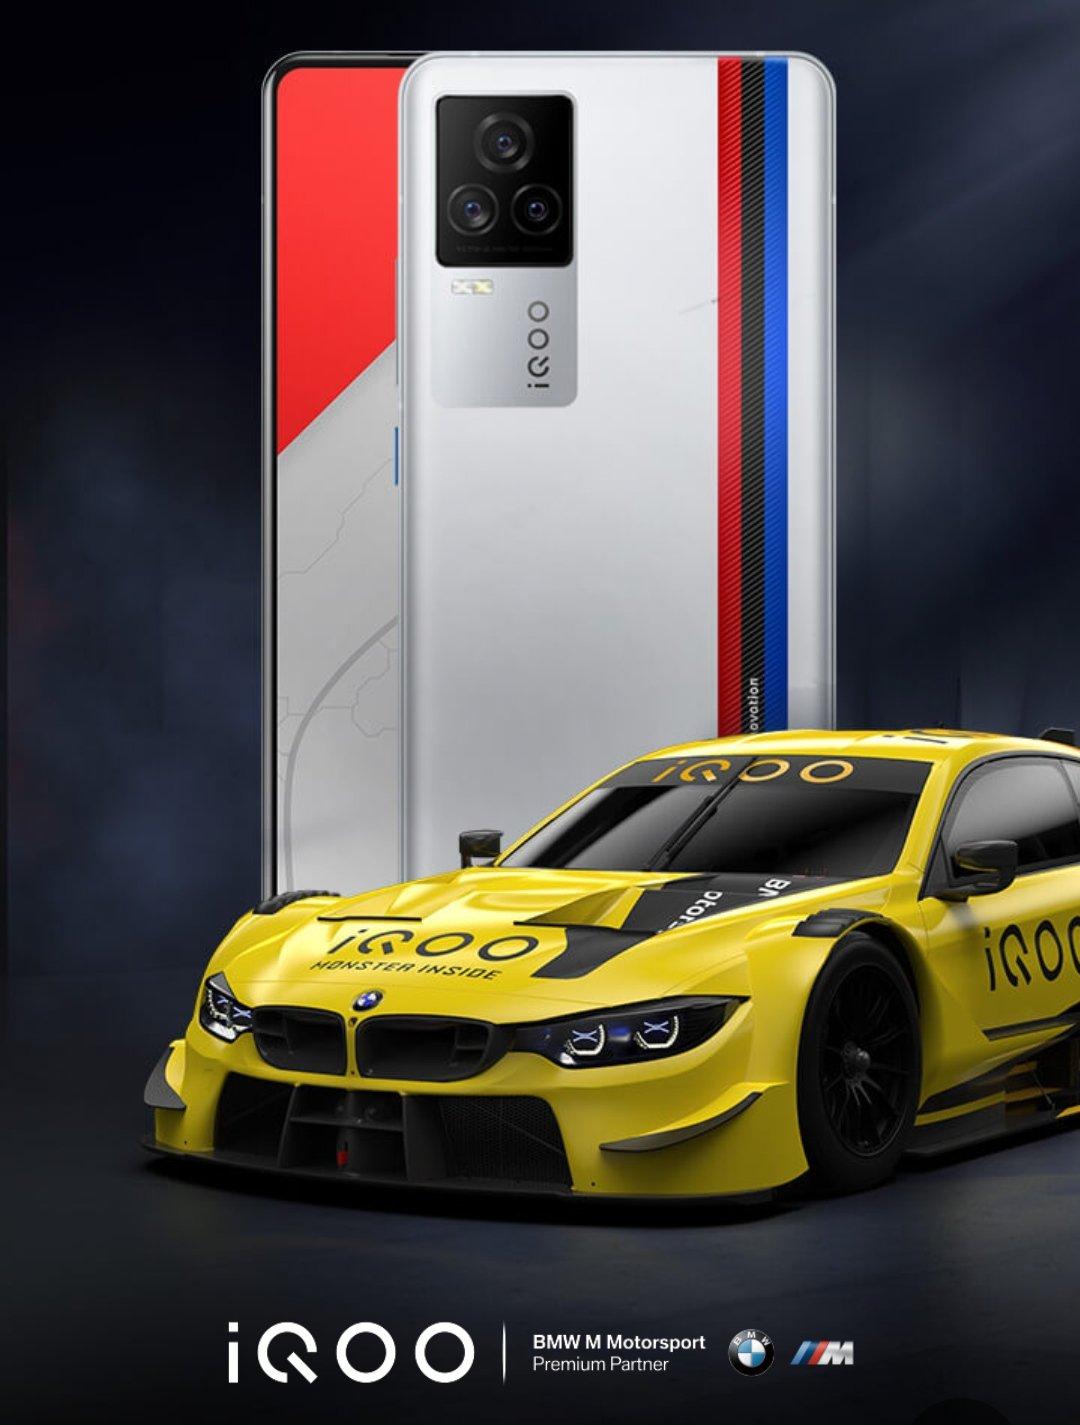 iQOO Partners With BMW For Its iQOO 7 & iQOO 7 Legend